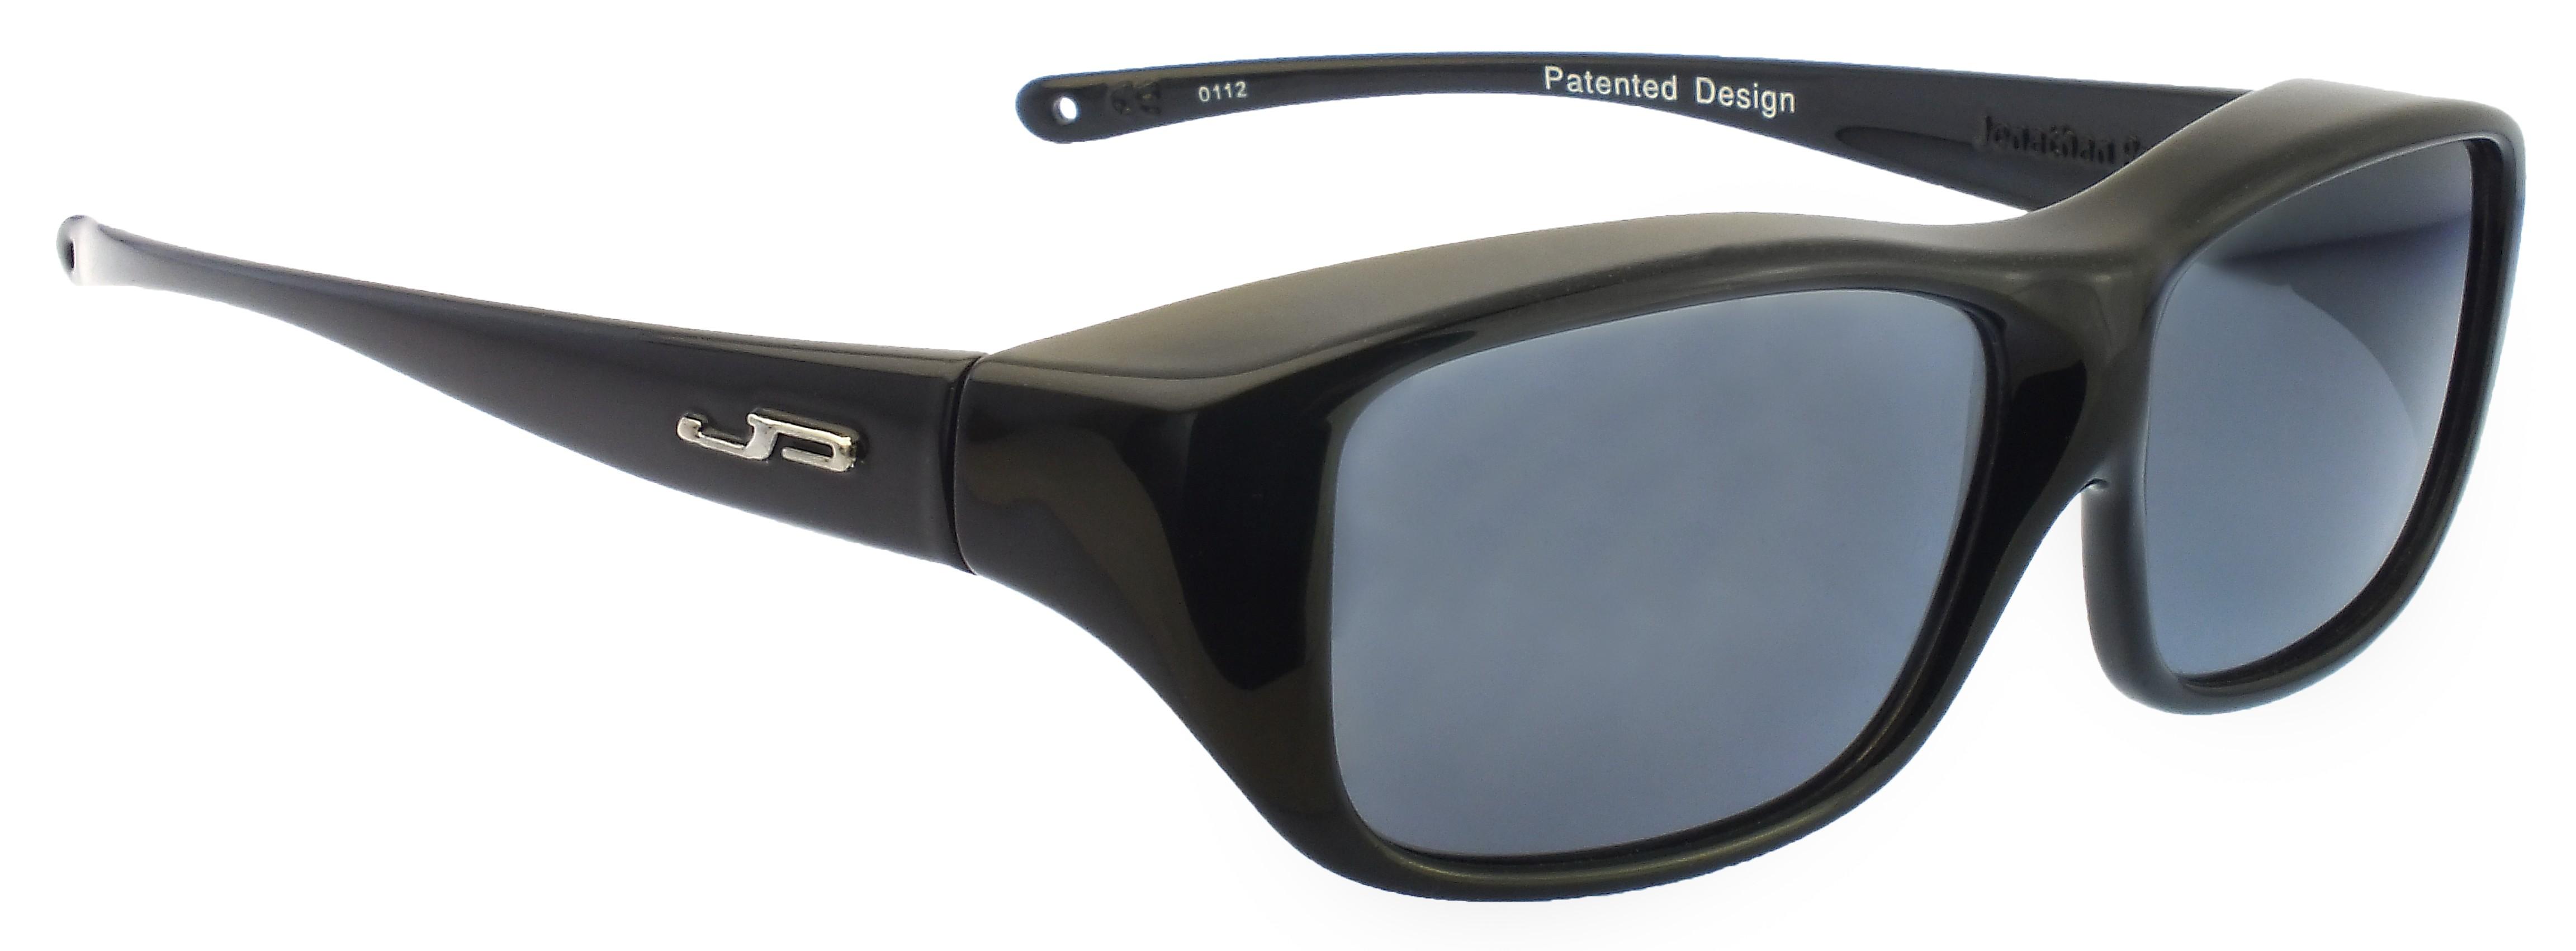 1120ece395 Jonathan Paul Fitovers Large Quamby Eternal Black Polarized Gray ...